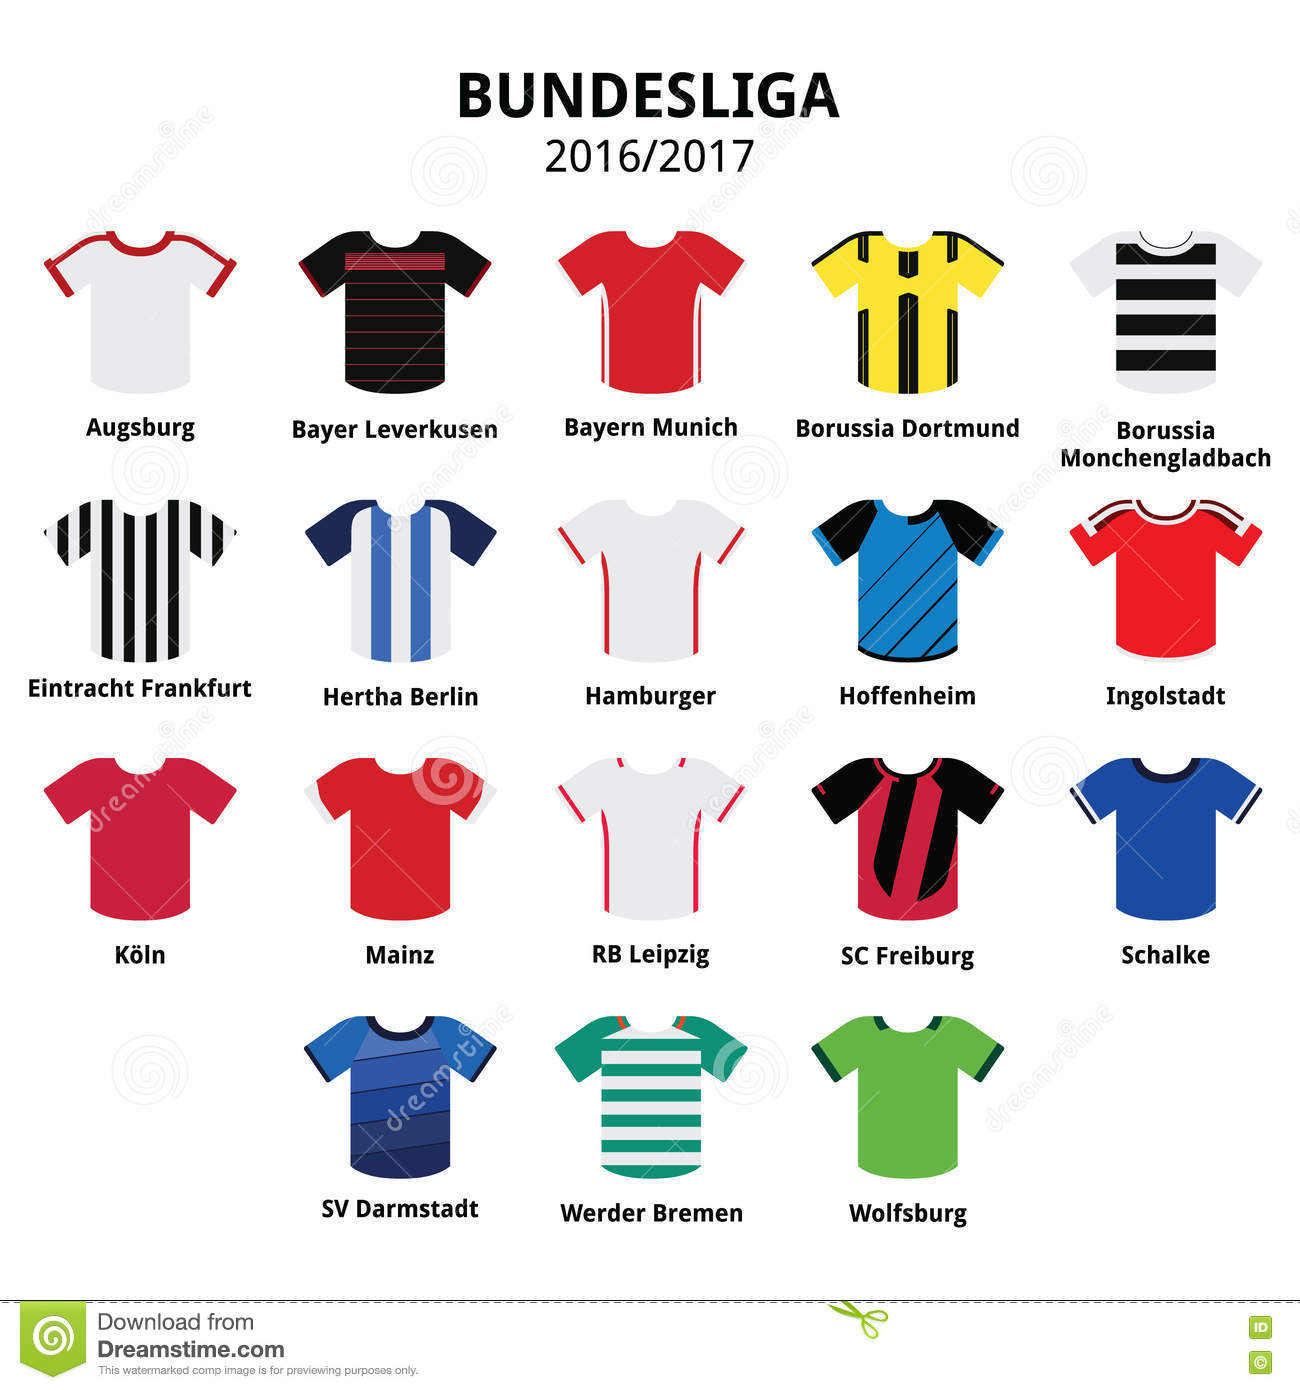 Consumption Clipart 20 Free Cliparts: Bundesliga Clipart 20 Free Cliparts